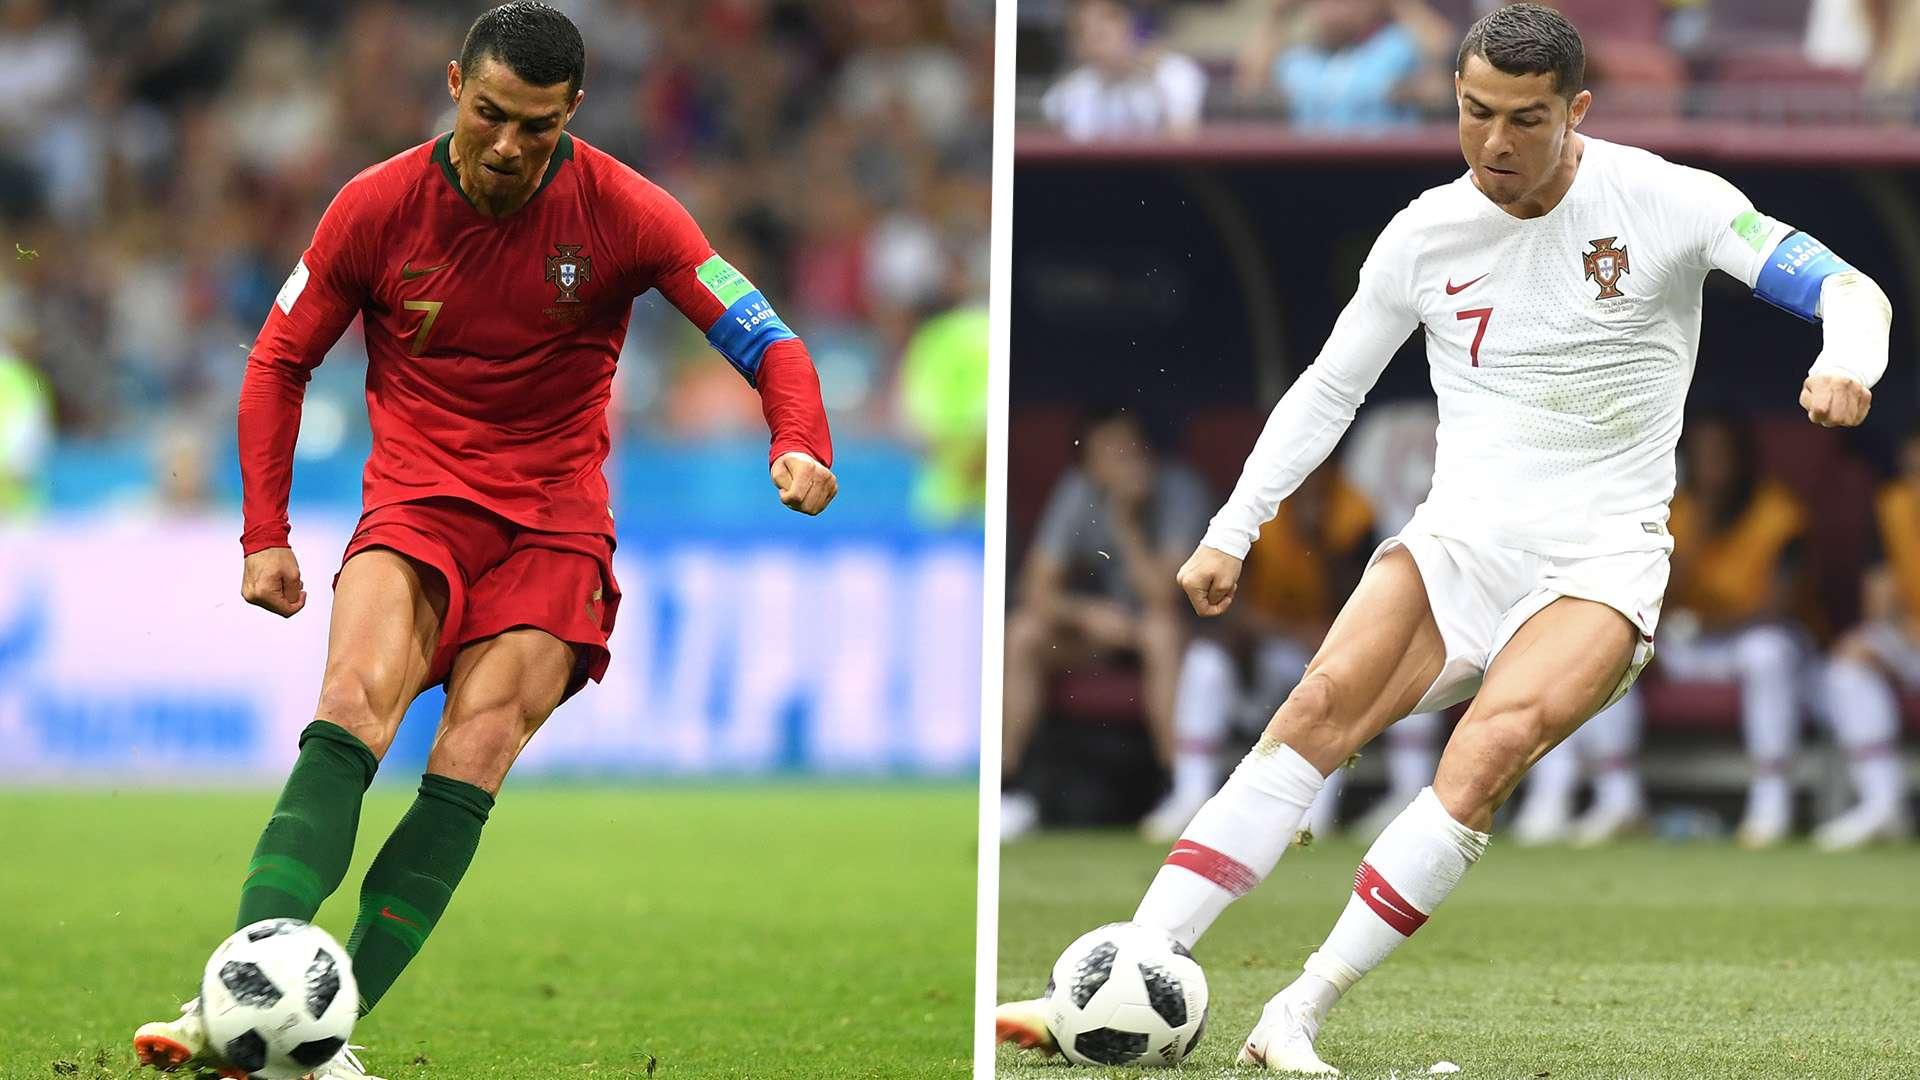 How To Take Free Kicks Like Cristiano Ronaldo Goal Com